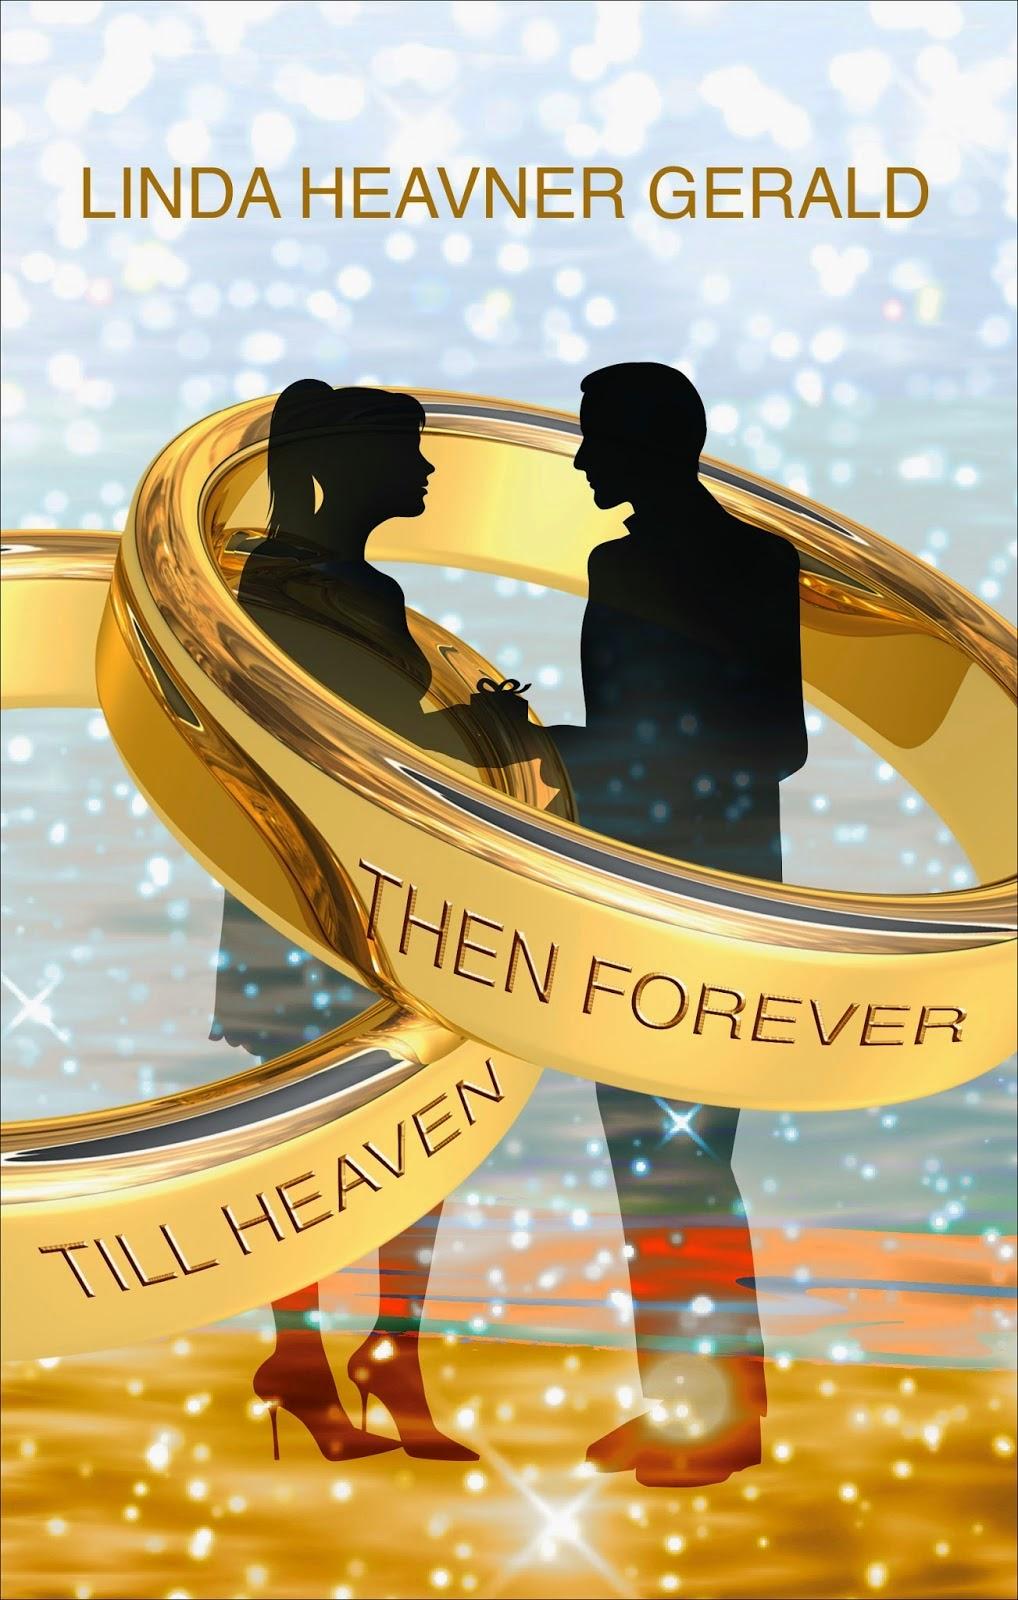 http://www.amazon.com/Heaven-Forever-Linda-Heavner-Gerald-ebook/dp/B00IZLR75M/ref=la_B00B6SPNPM_1_1?s=books&ie=UTF8&qid=1419897639&sr=1-1